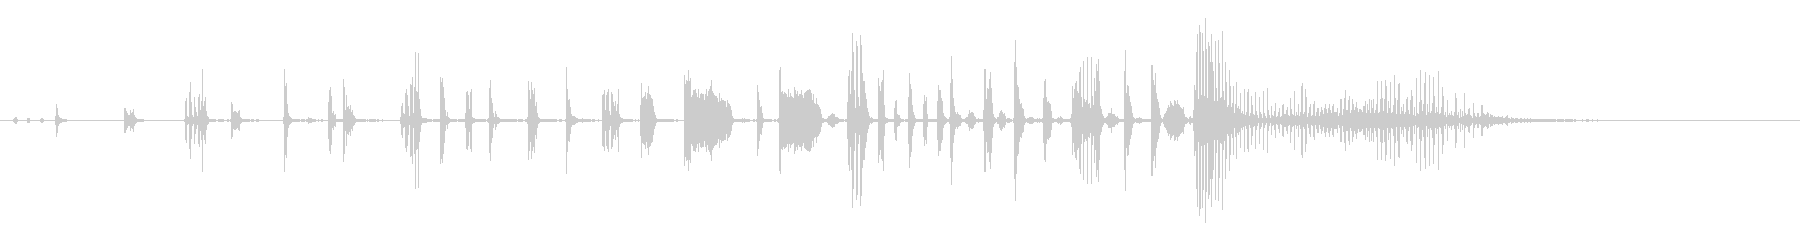 Vocal Wheezing、Fl...の未再生の波形